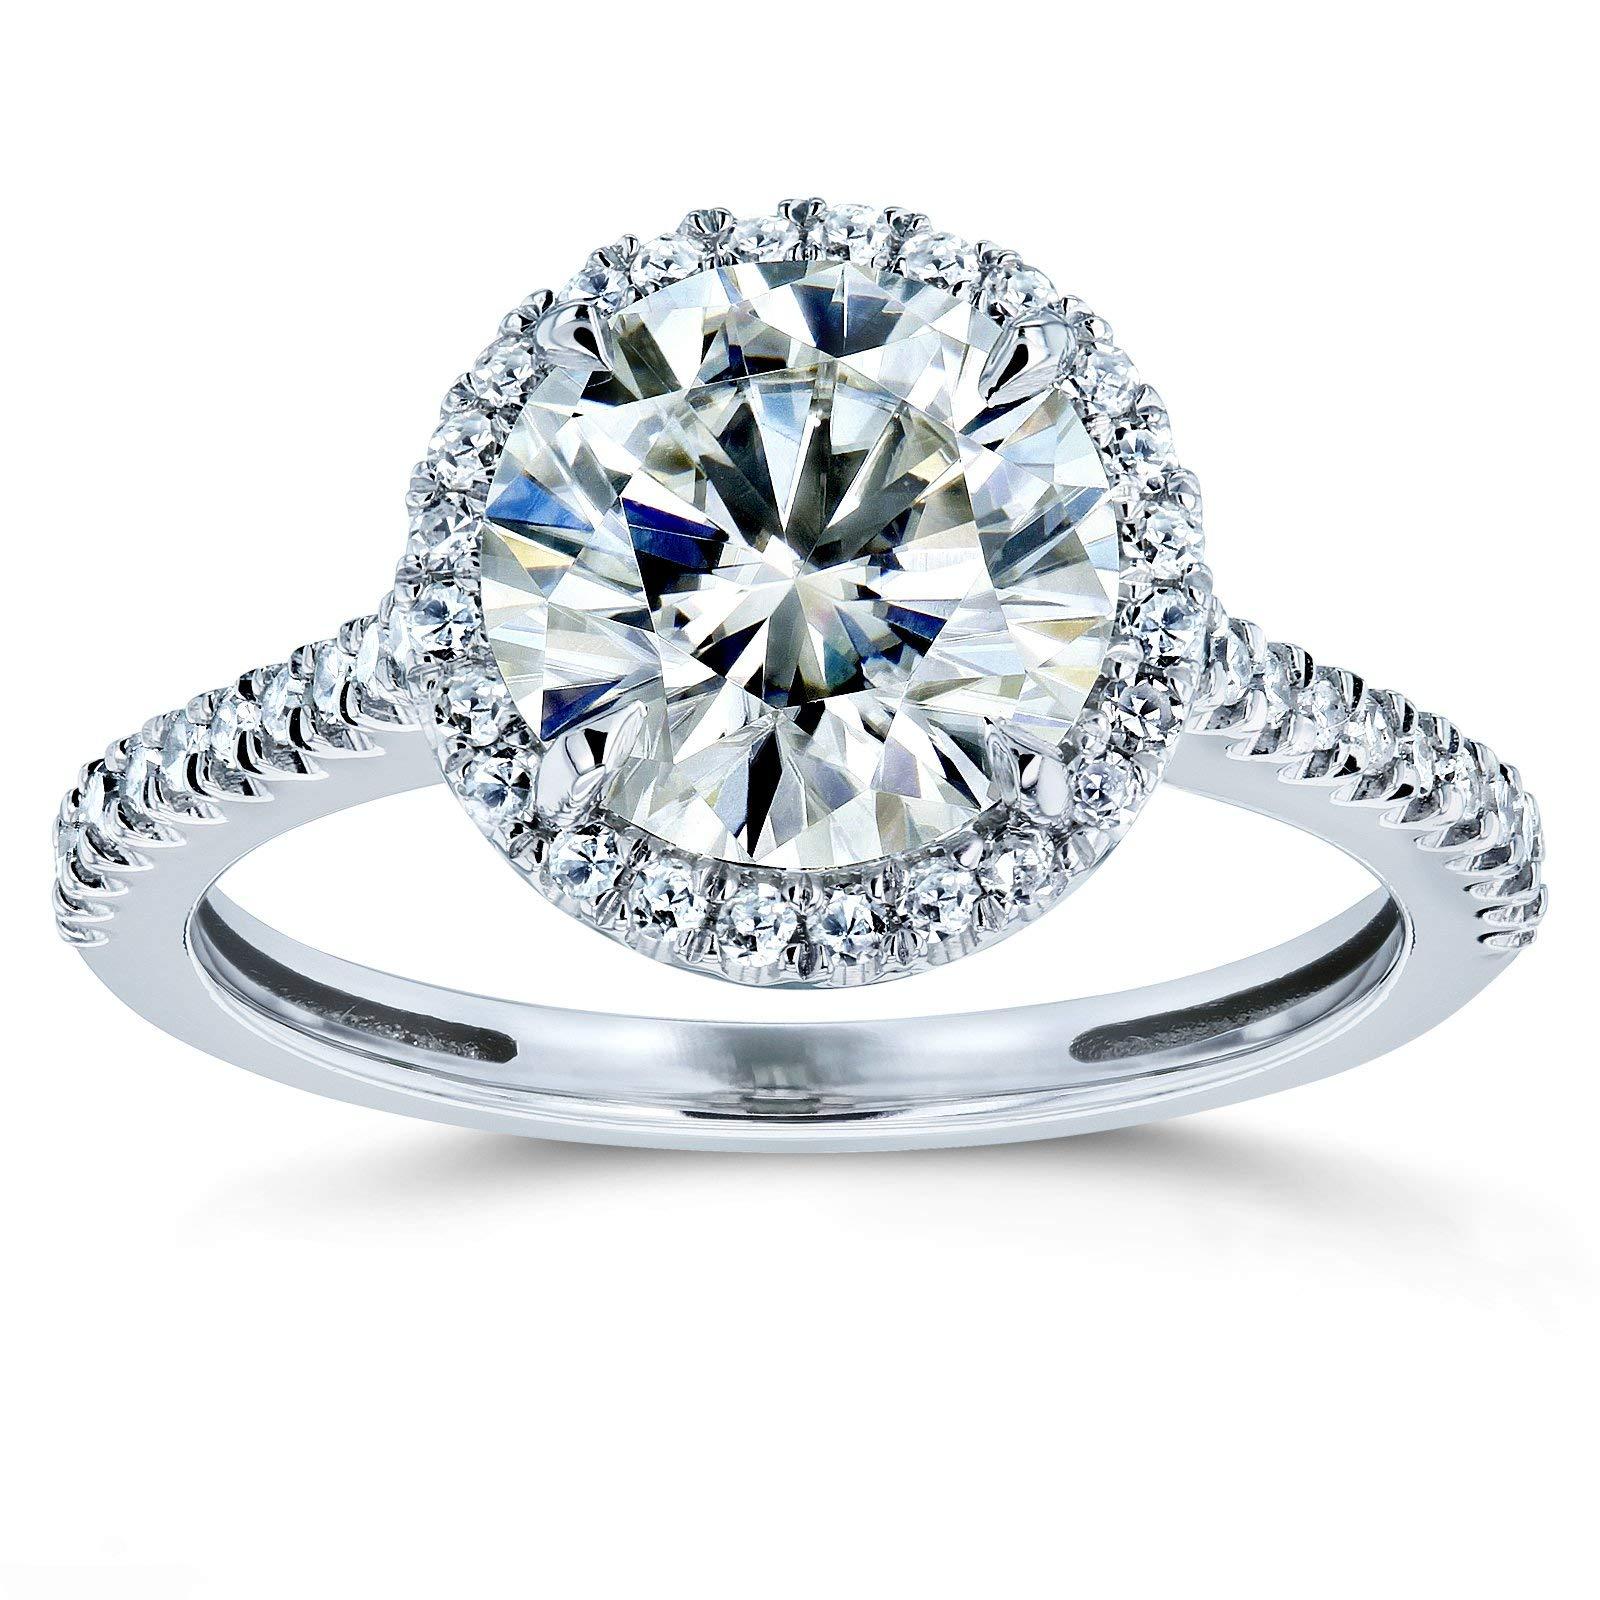 Round Brilliant Kobelli Moissanite Halo Engagement Ring 2 1/6 CTW 14k White Gold, 4.5